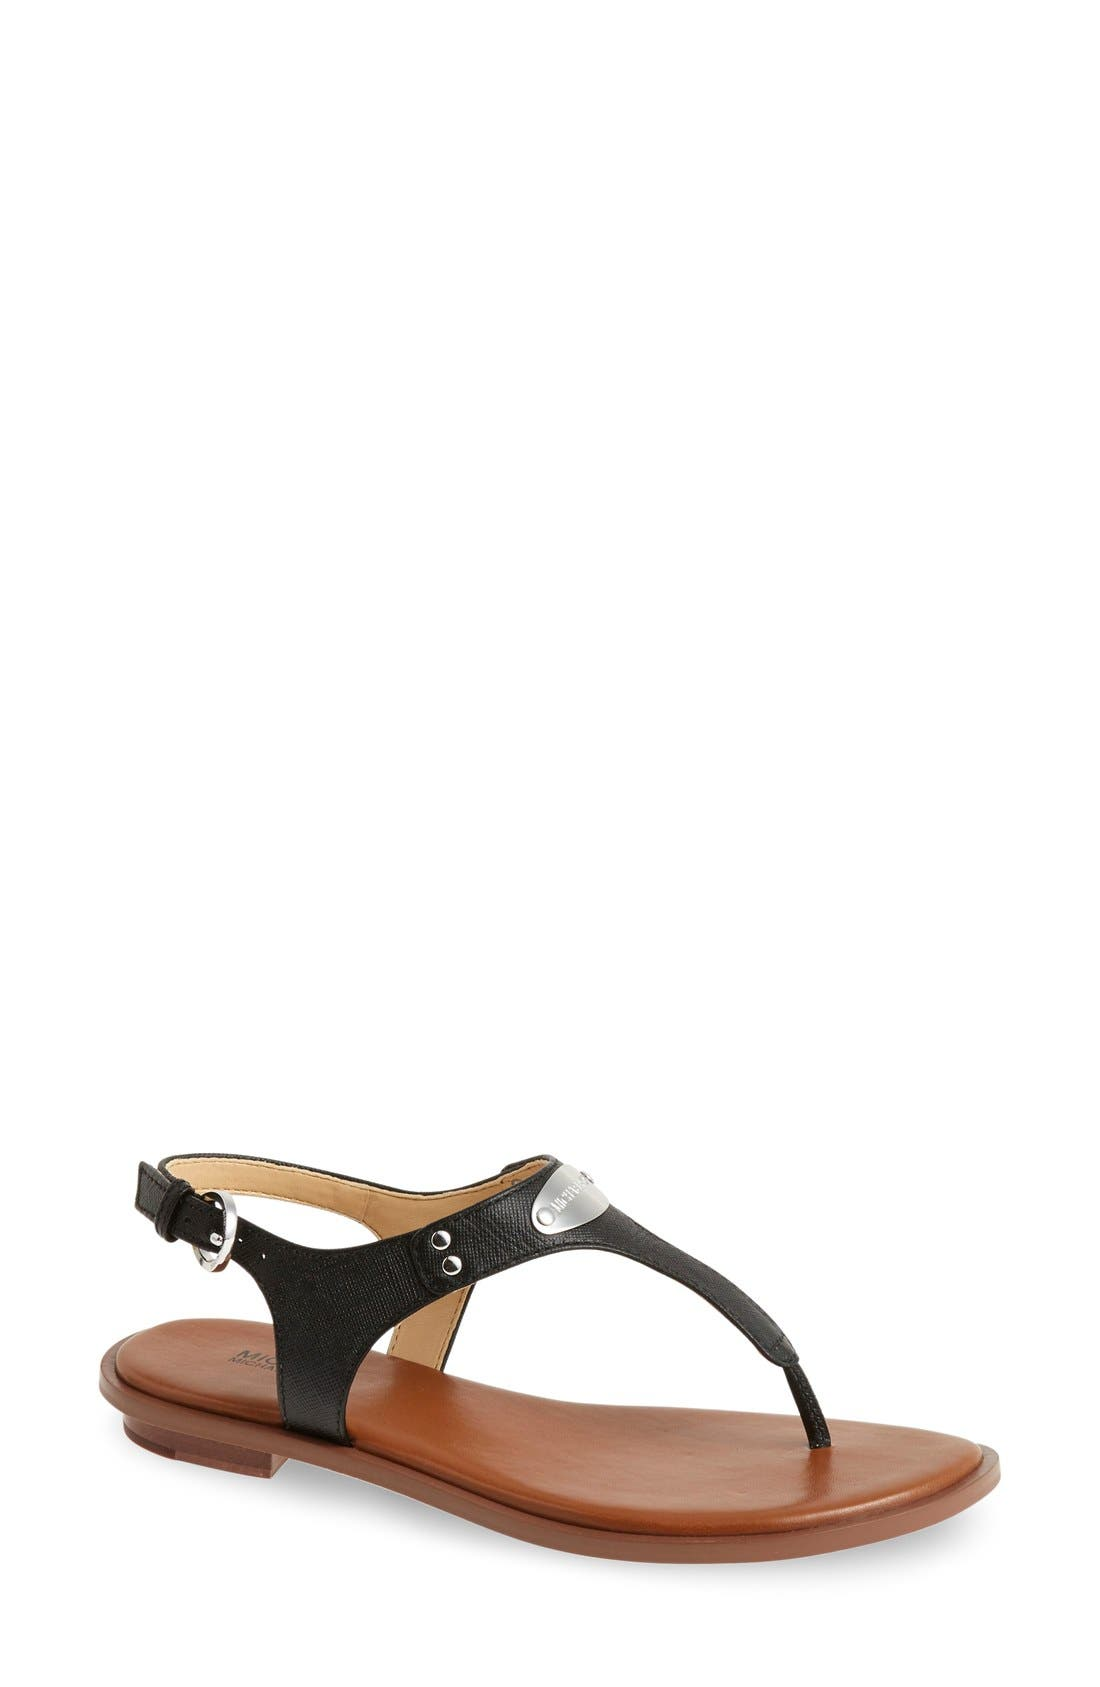 'Plate' Thong Sandal,                         Main,                         color, BLACK